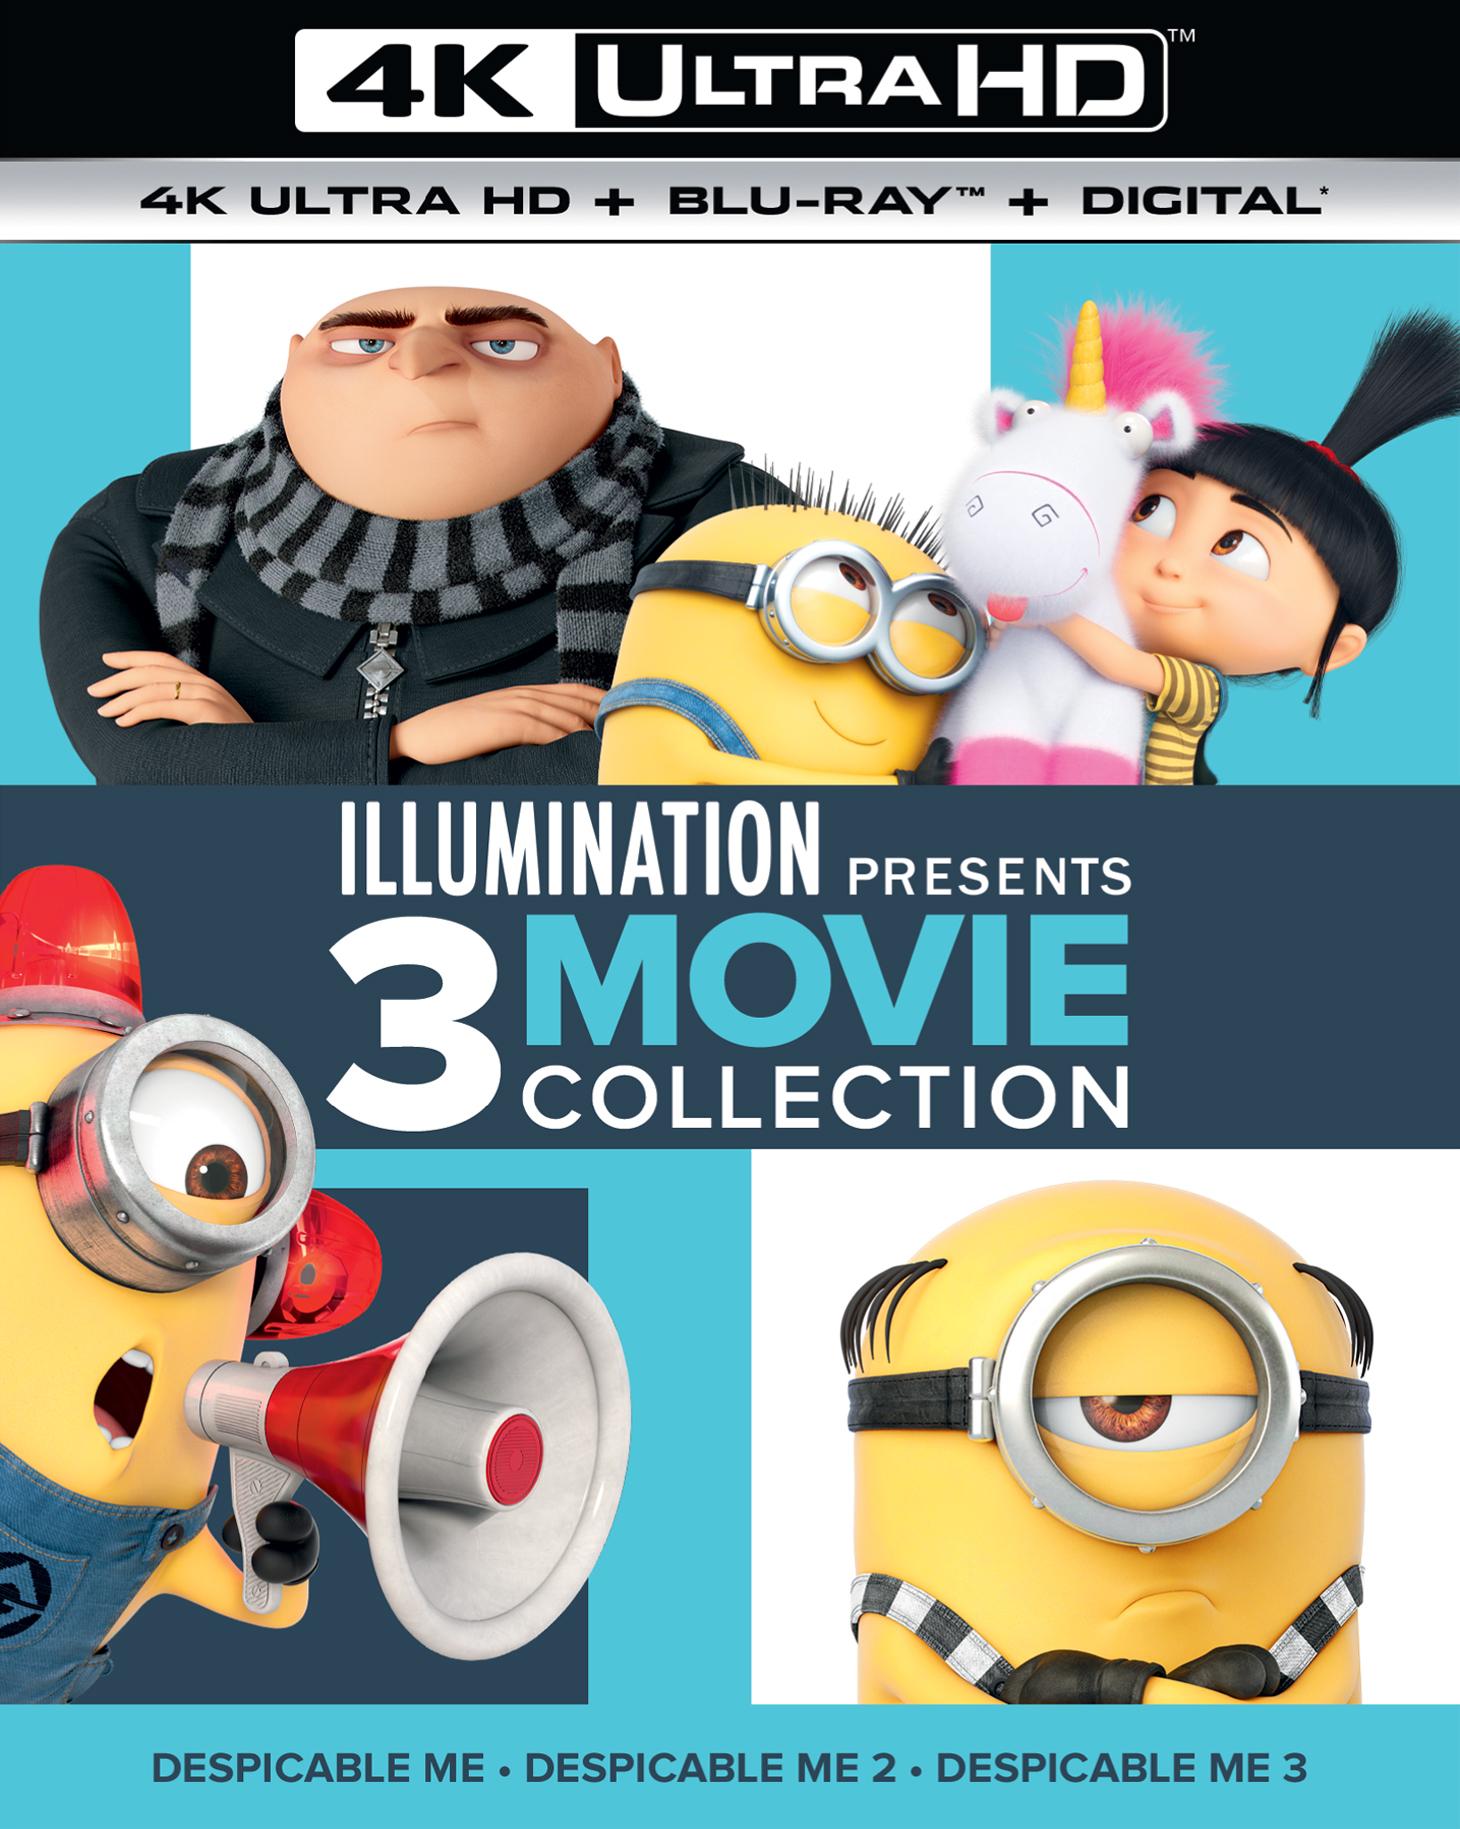 Illumination Presents: 3-Movie Collection 4K (2010-2017) 4K Ultra HD Blu-ray